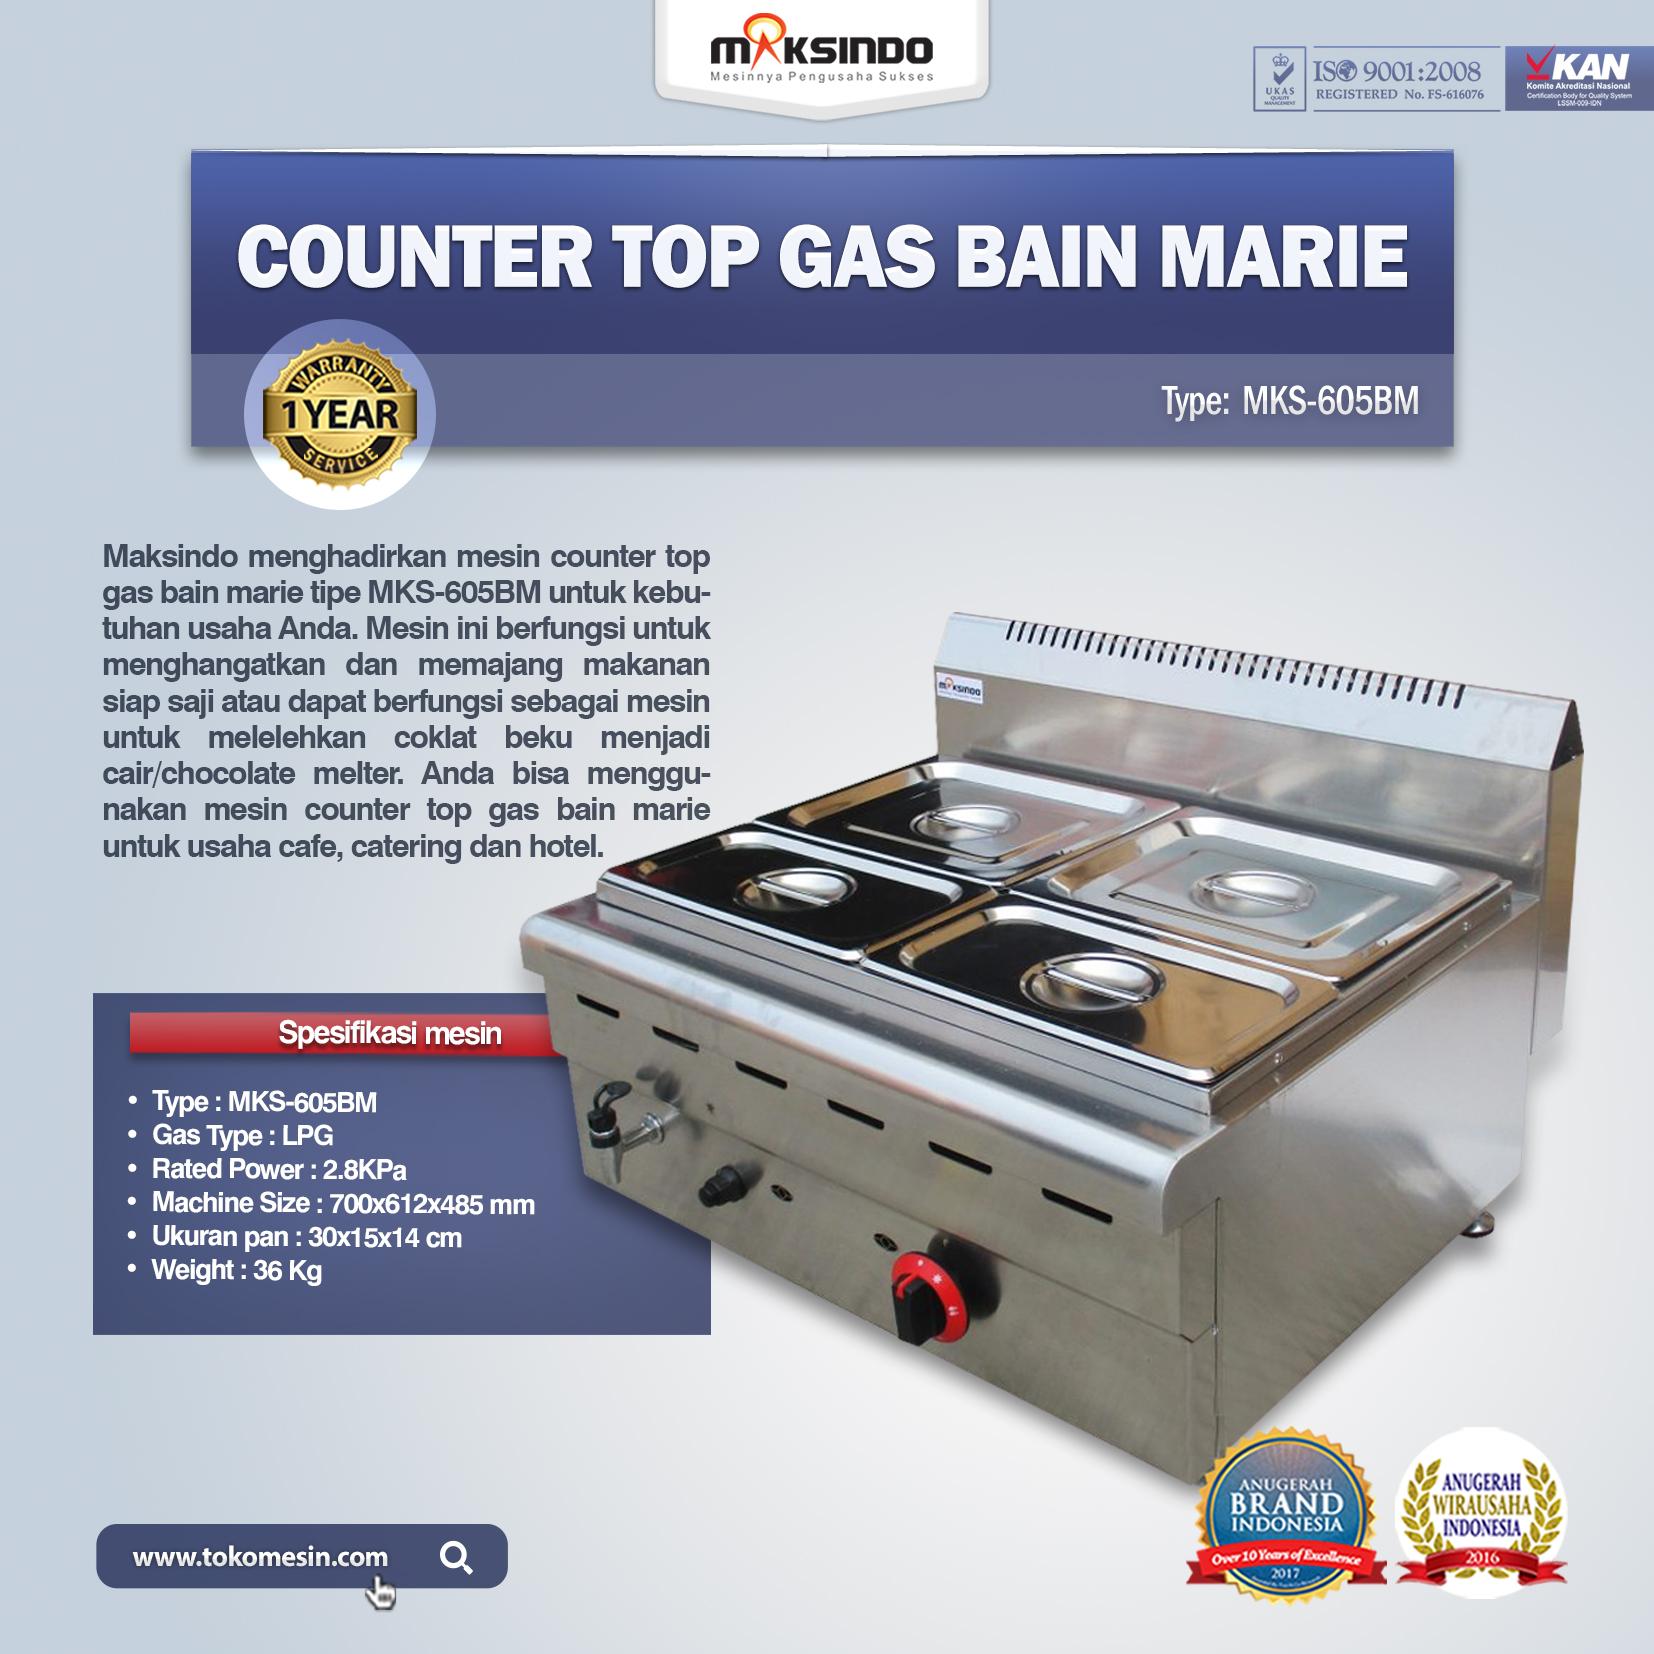 Counter Top Gas Bain Marie MKS-605BM